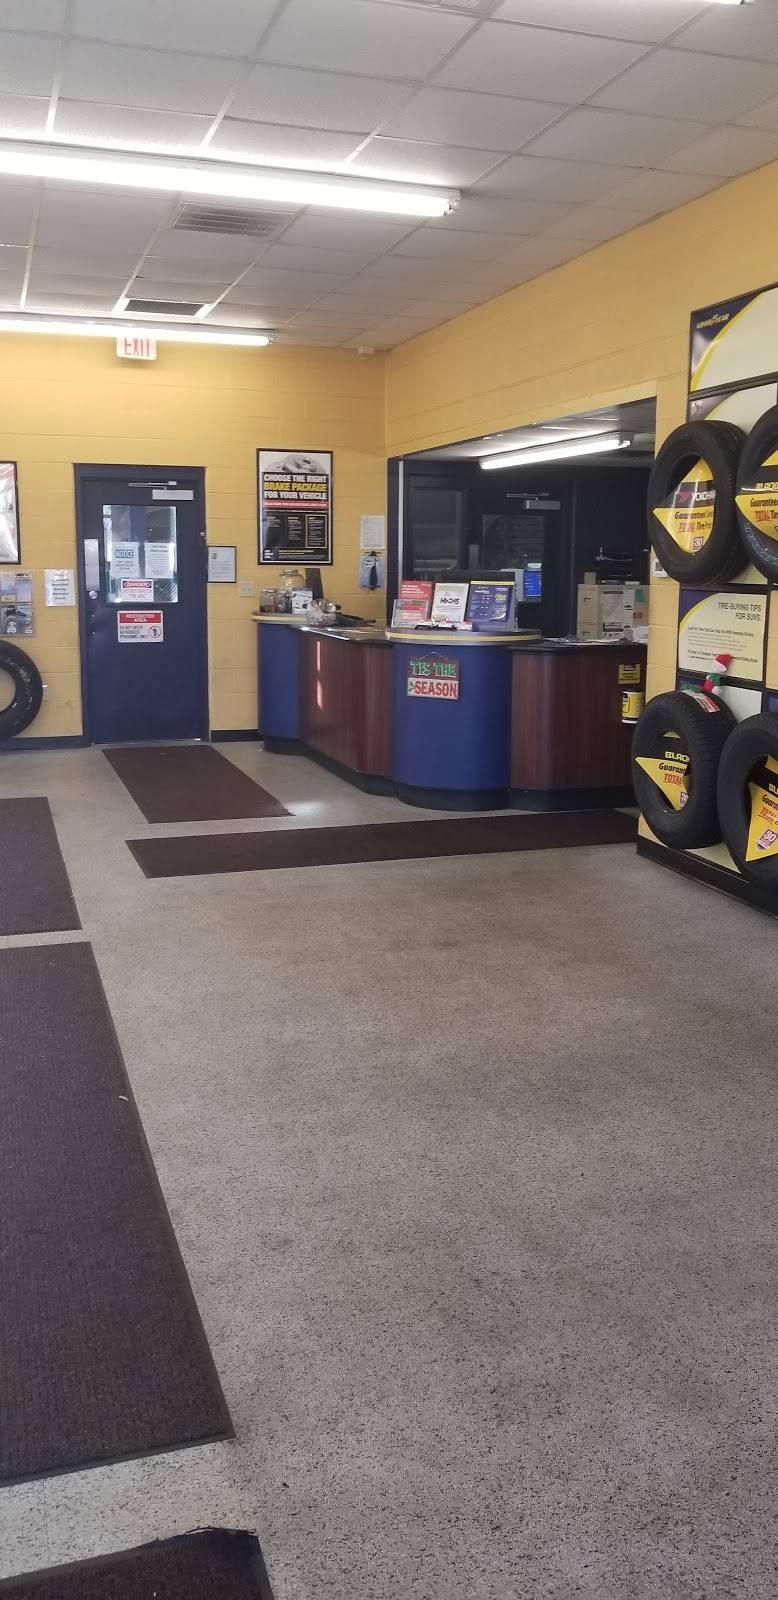 Tire Choice Auto Service Centers - car repair    Photo 3 of 7   Address: 221 Carmichael Way, Chesapeake, VA 23322, USA   Phone: (757) 346-5676